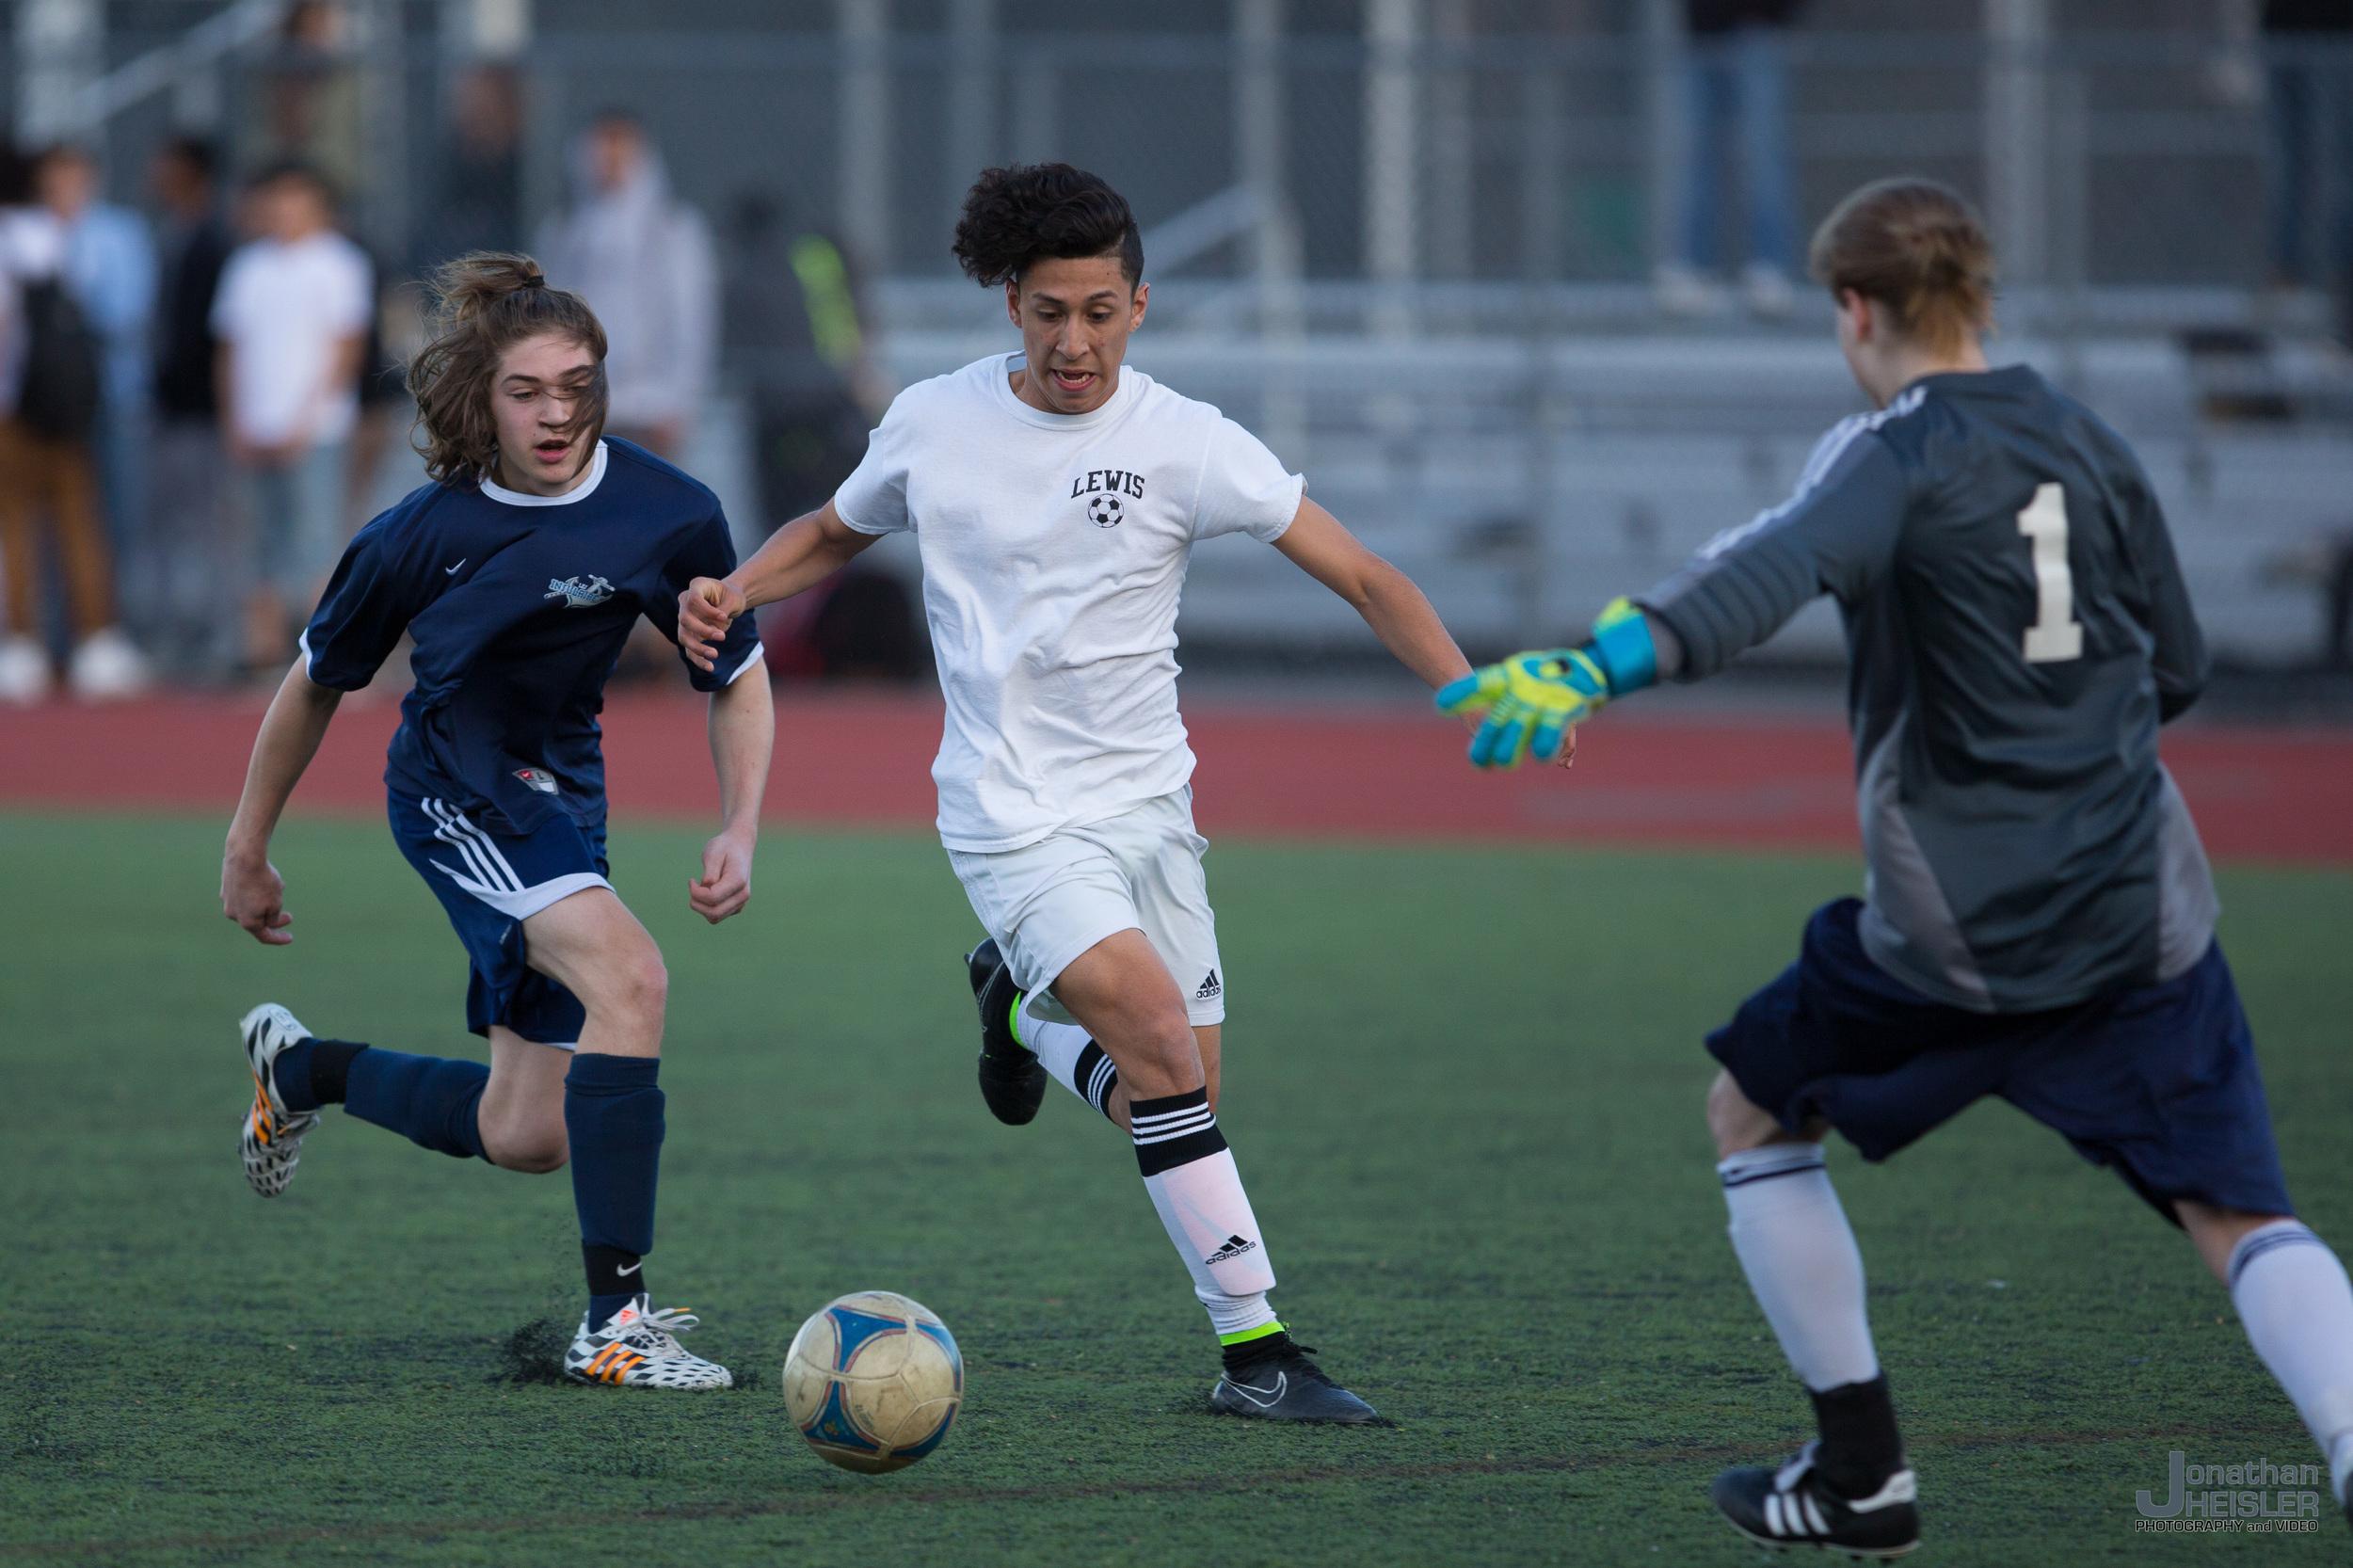 Francis Lewis High School Soccer _ Jonathan Heisler (15).jpg